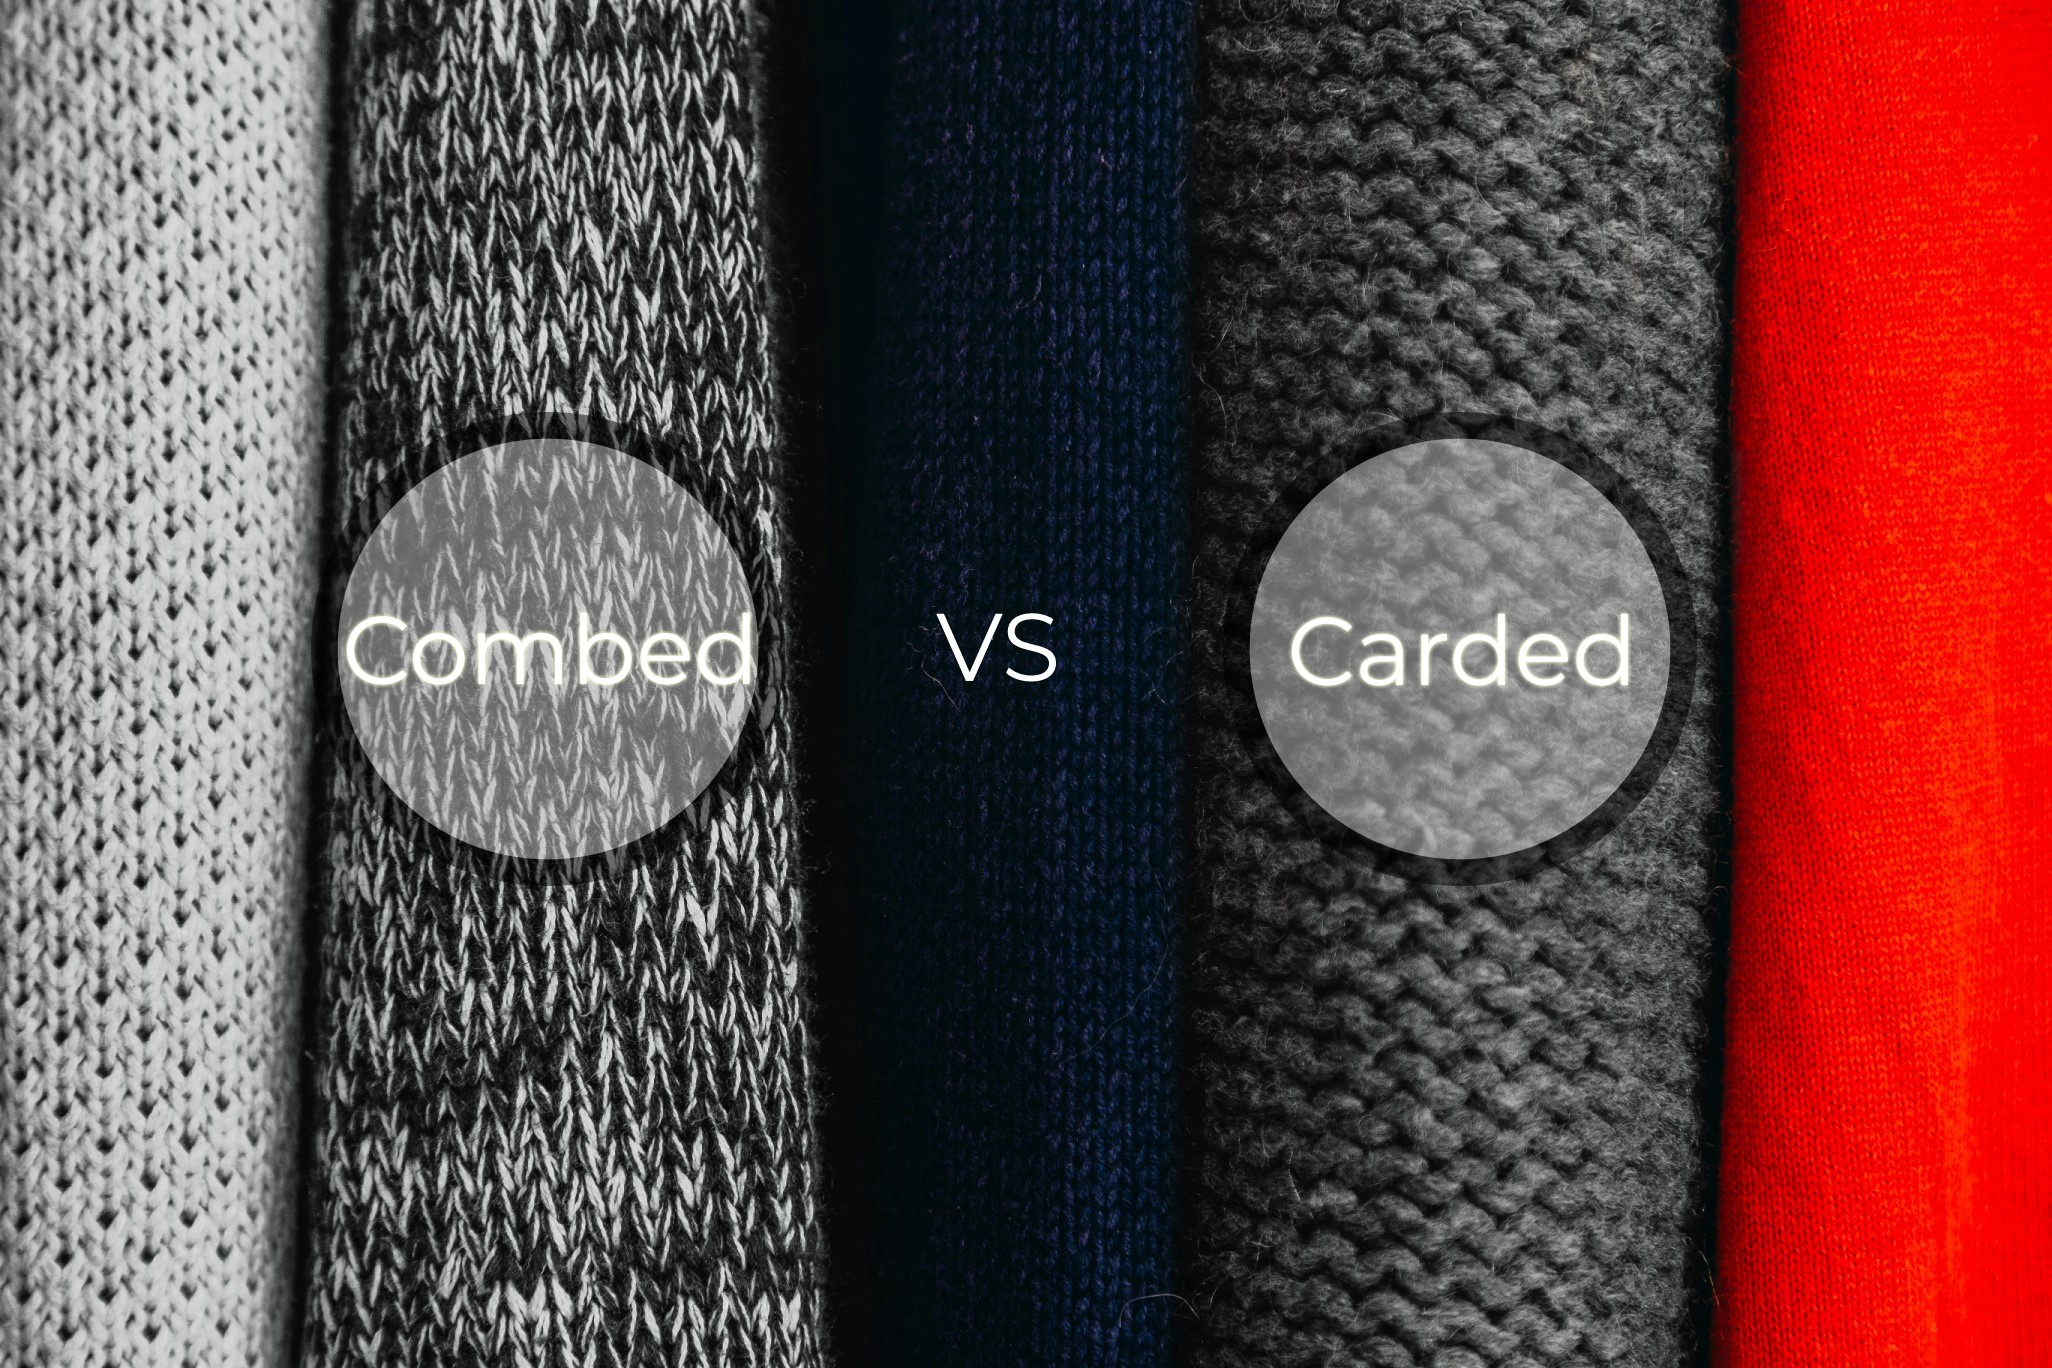 perbedaan kaos cotton combed dan carded